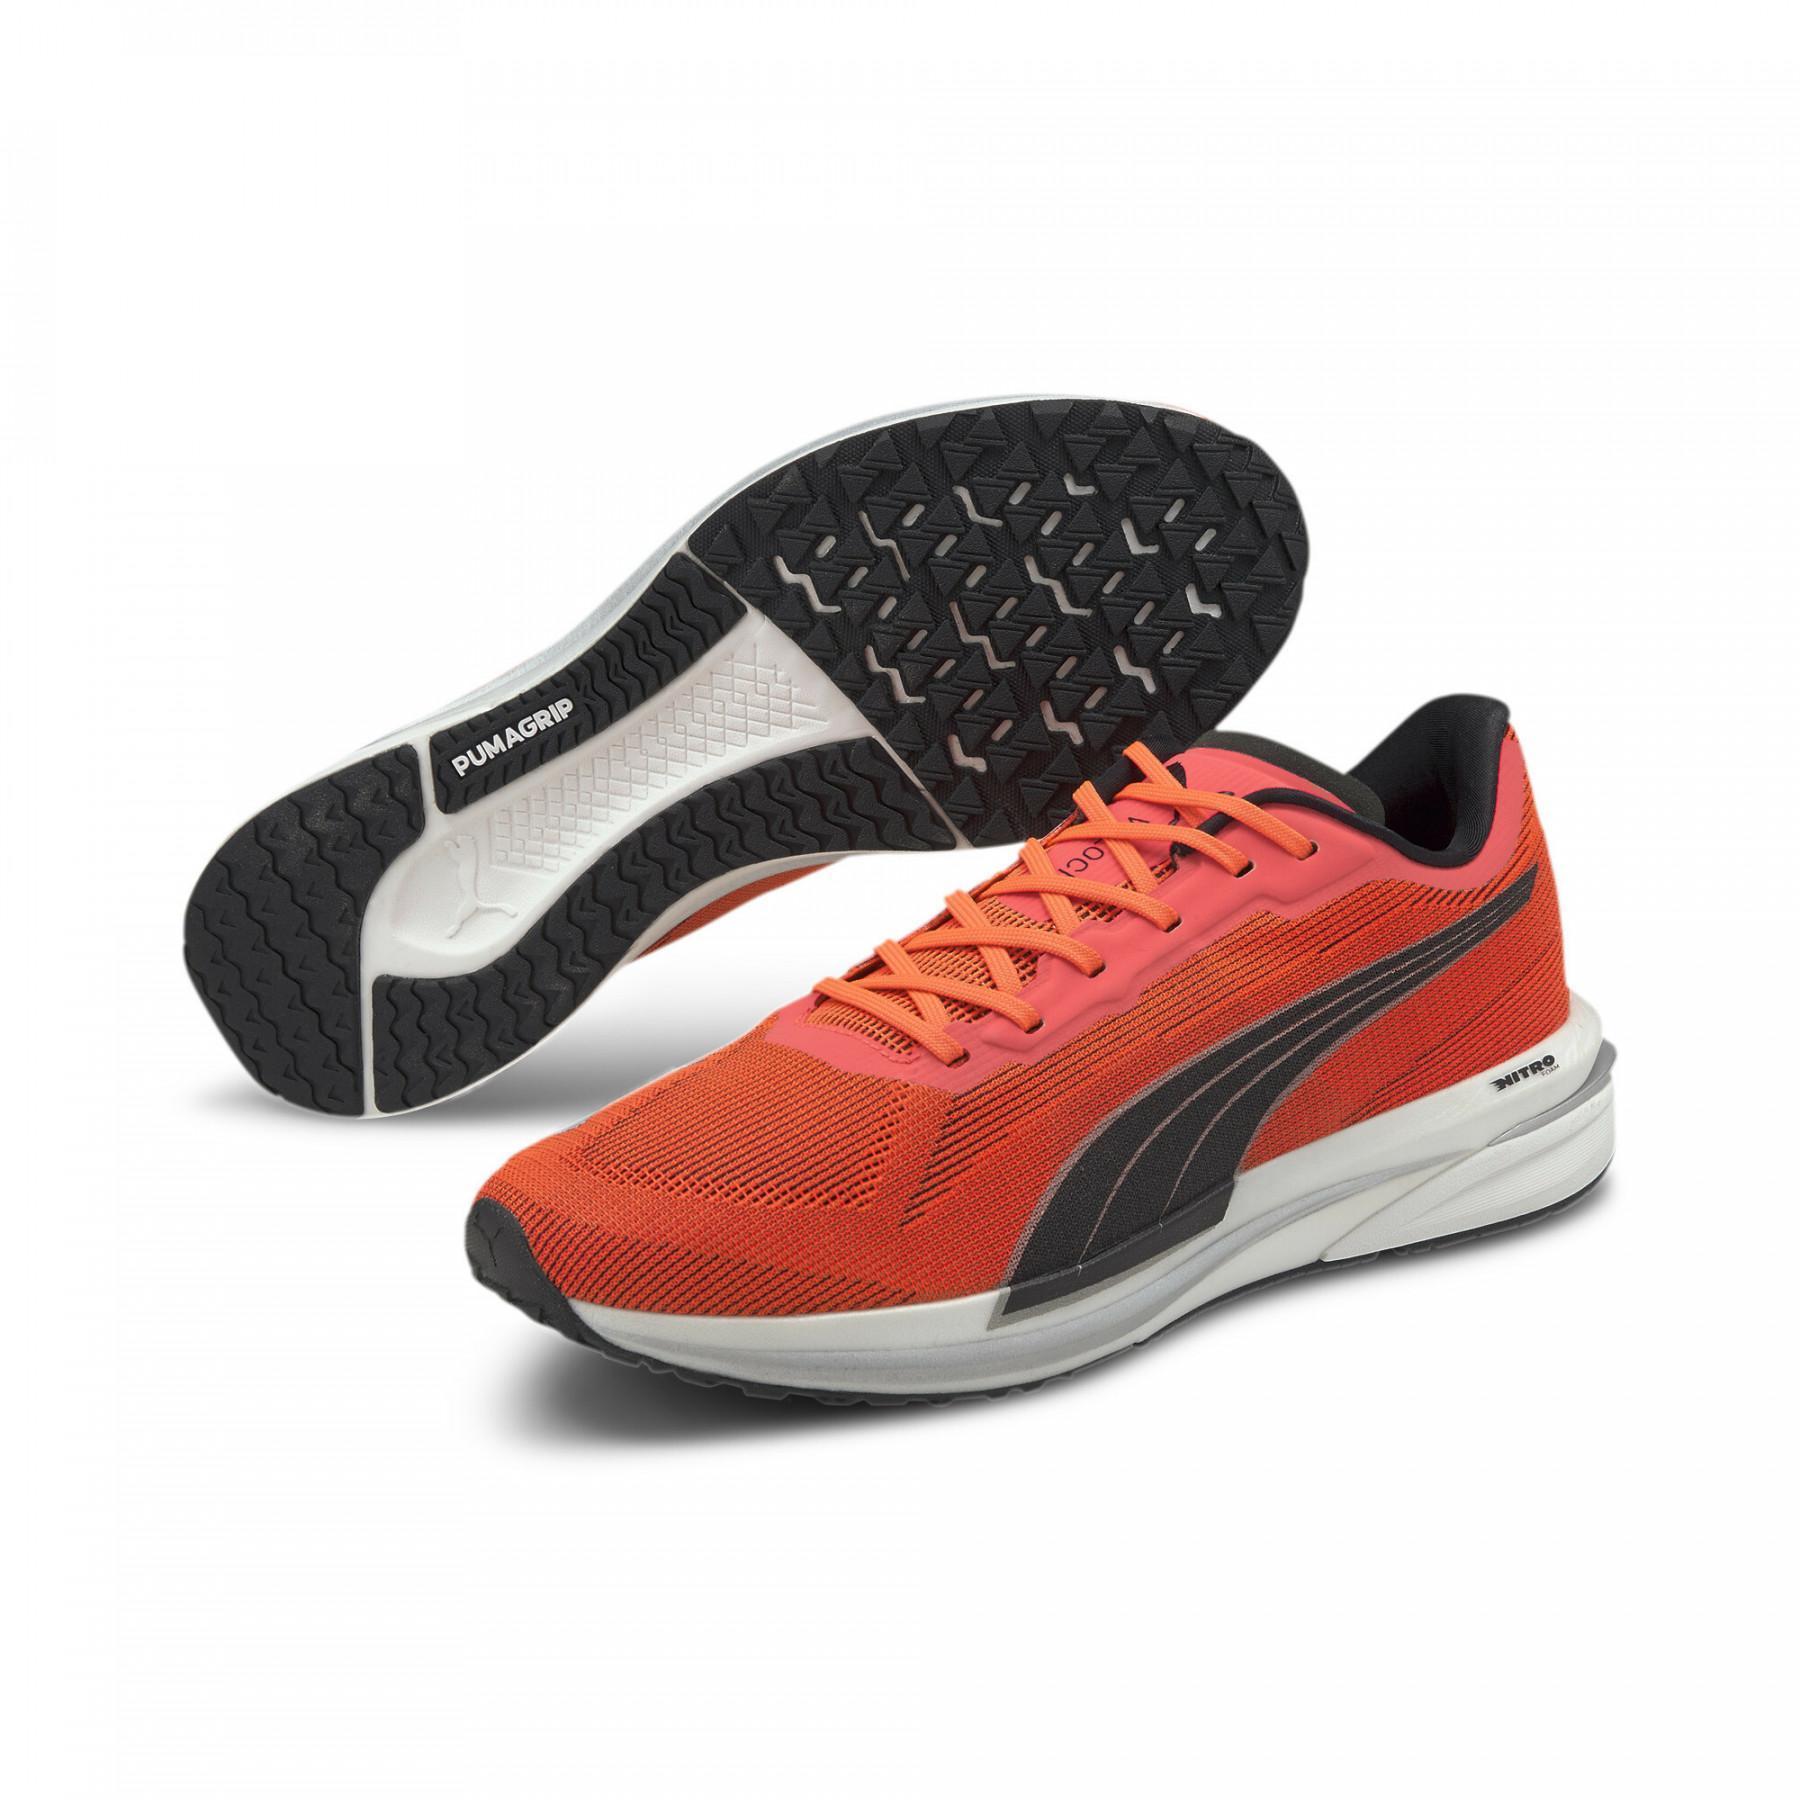 Puma Shoes Velocity Nitro